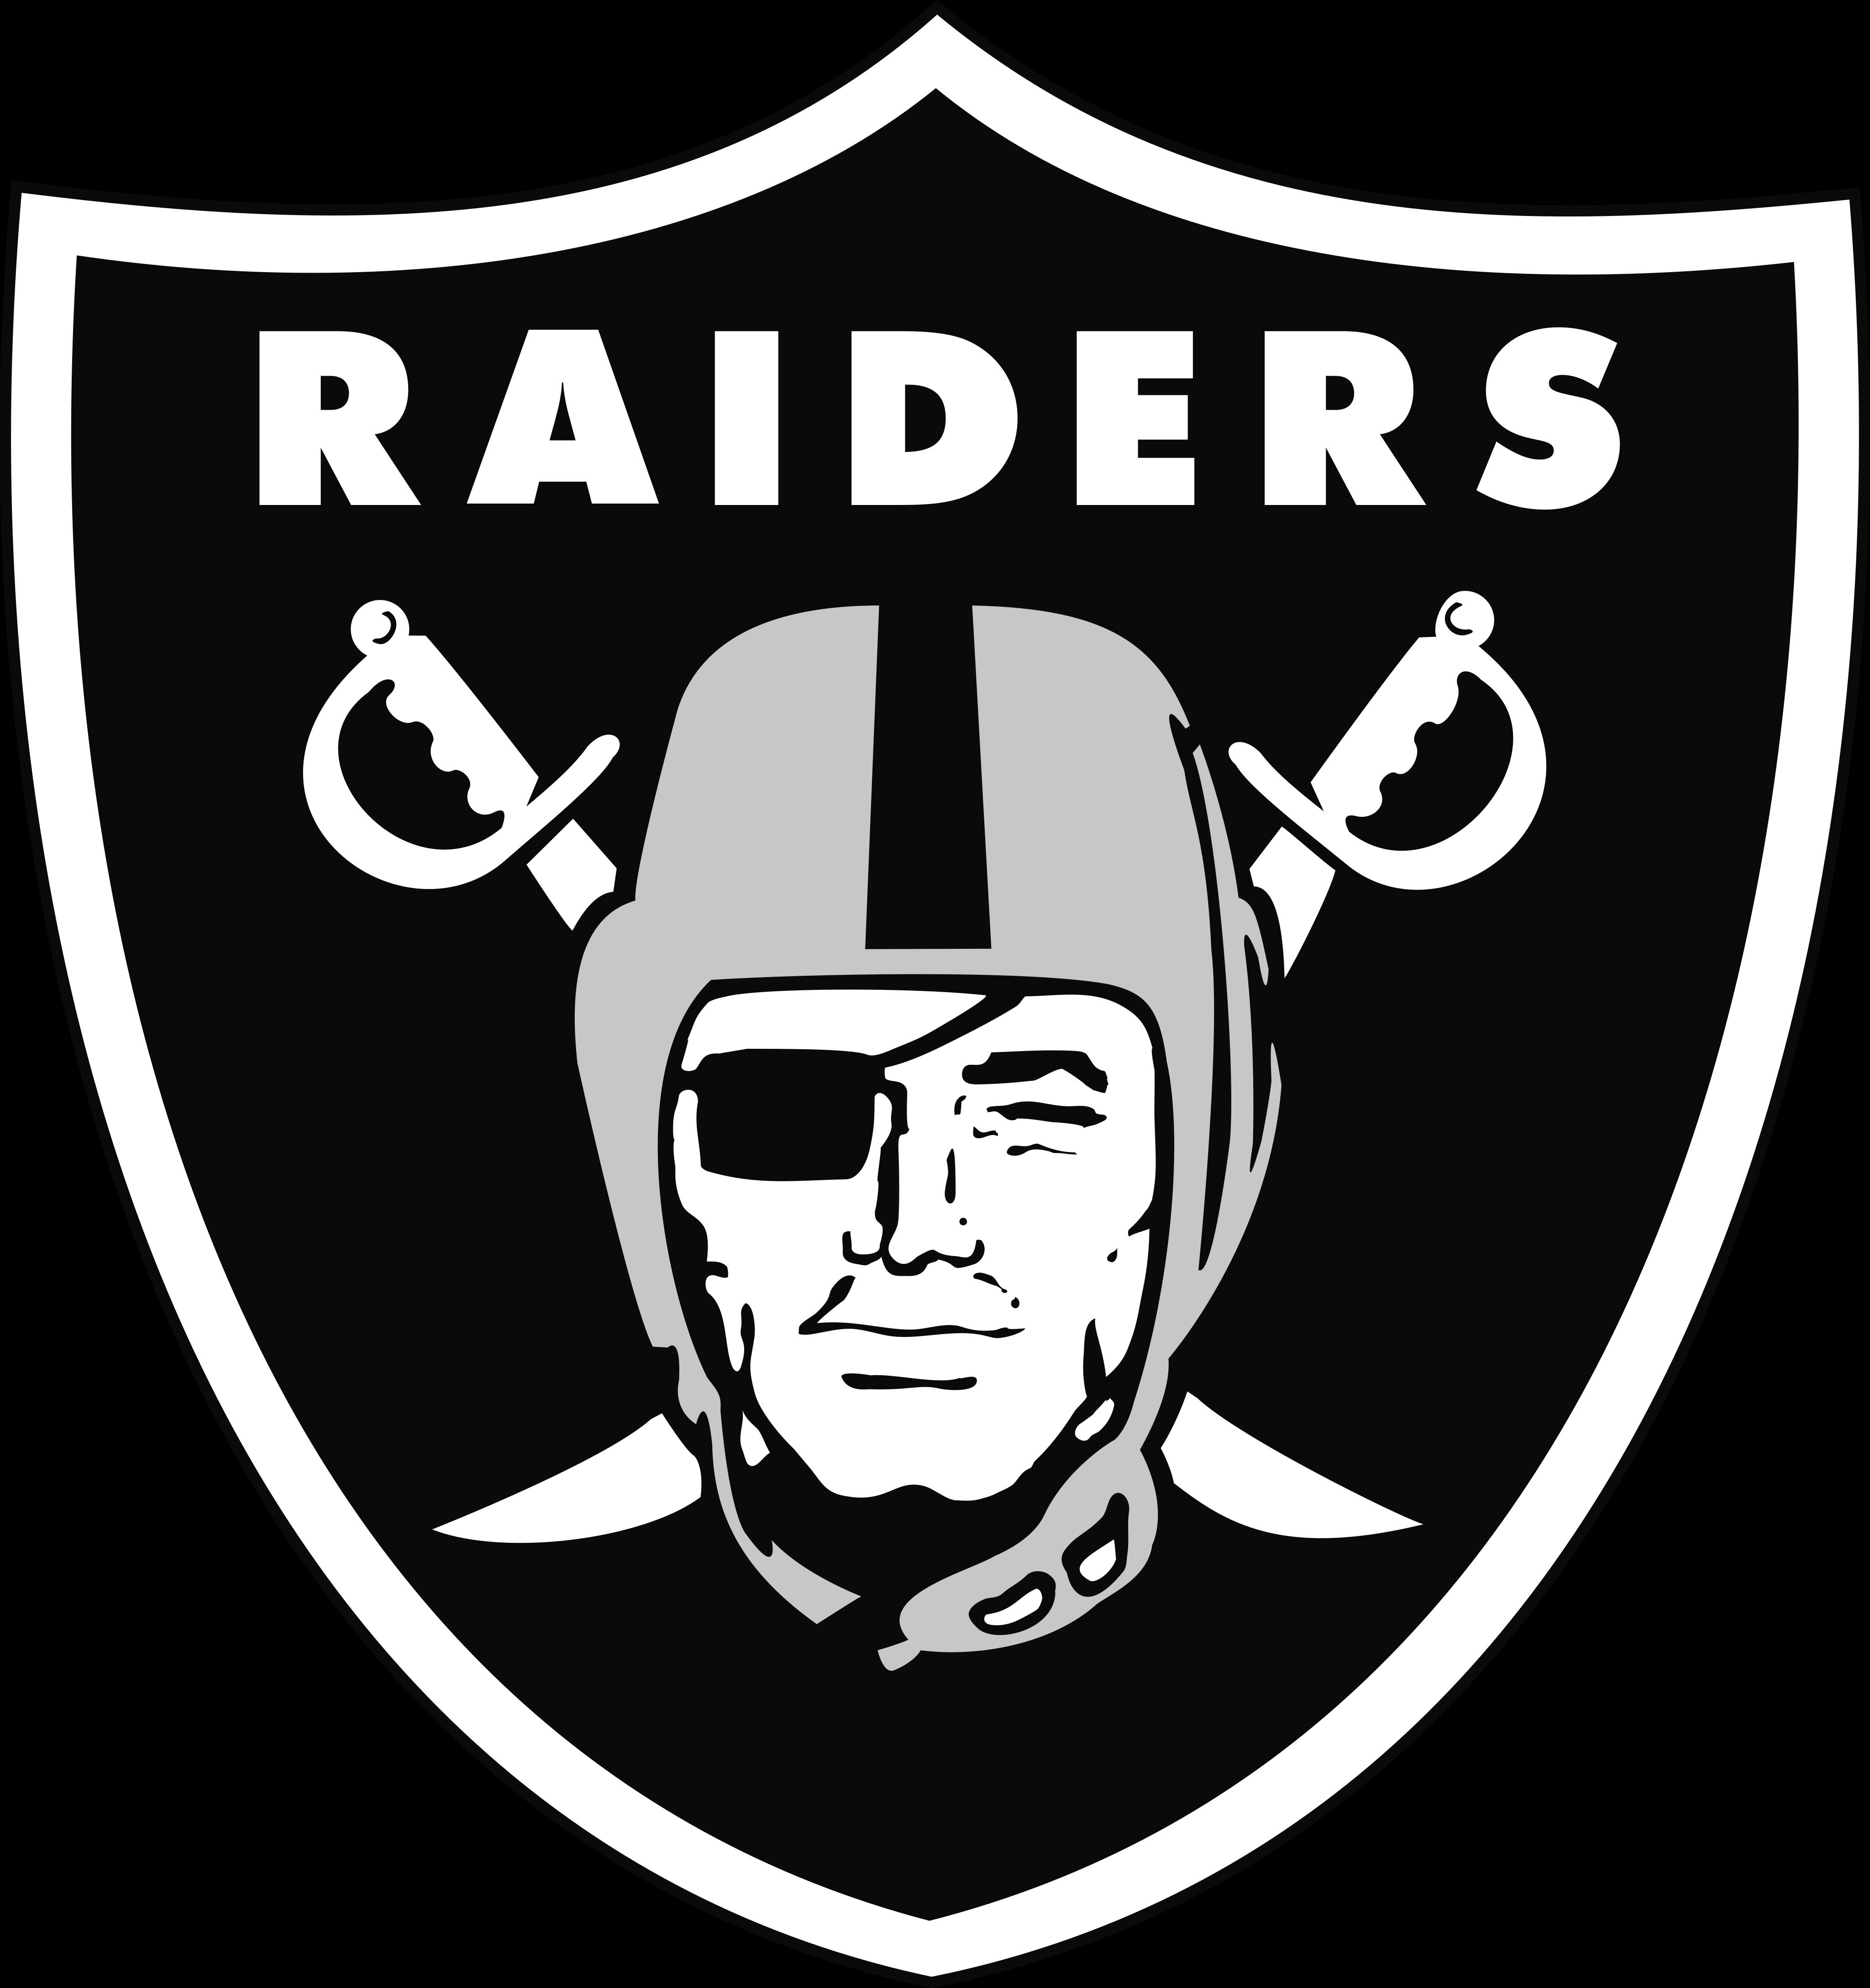 las vegas raiders logo - Las Vegas Raiders Logo